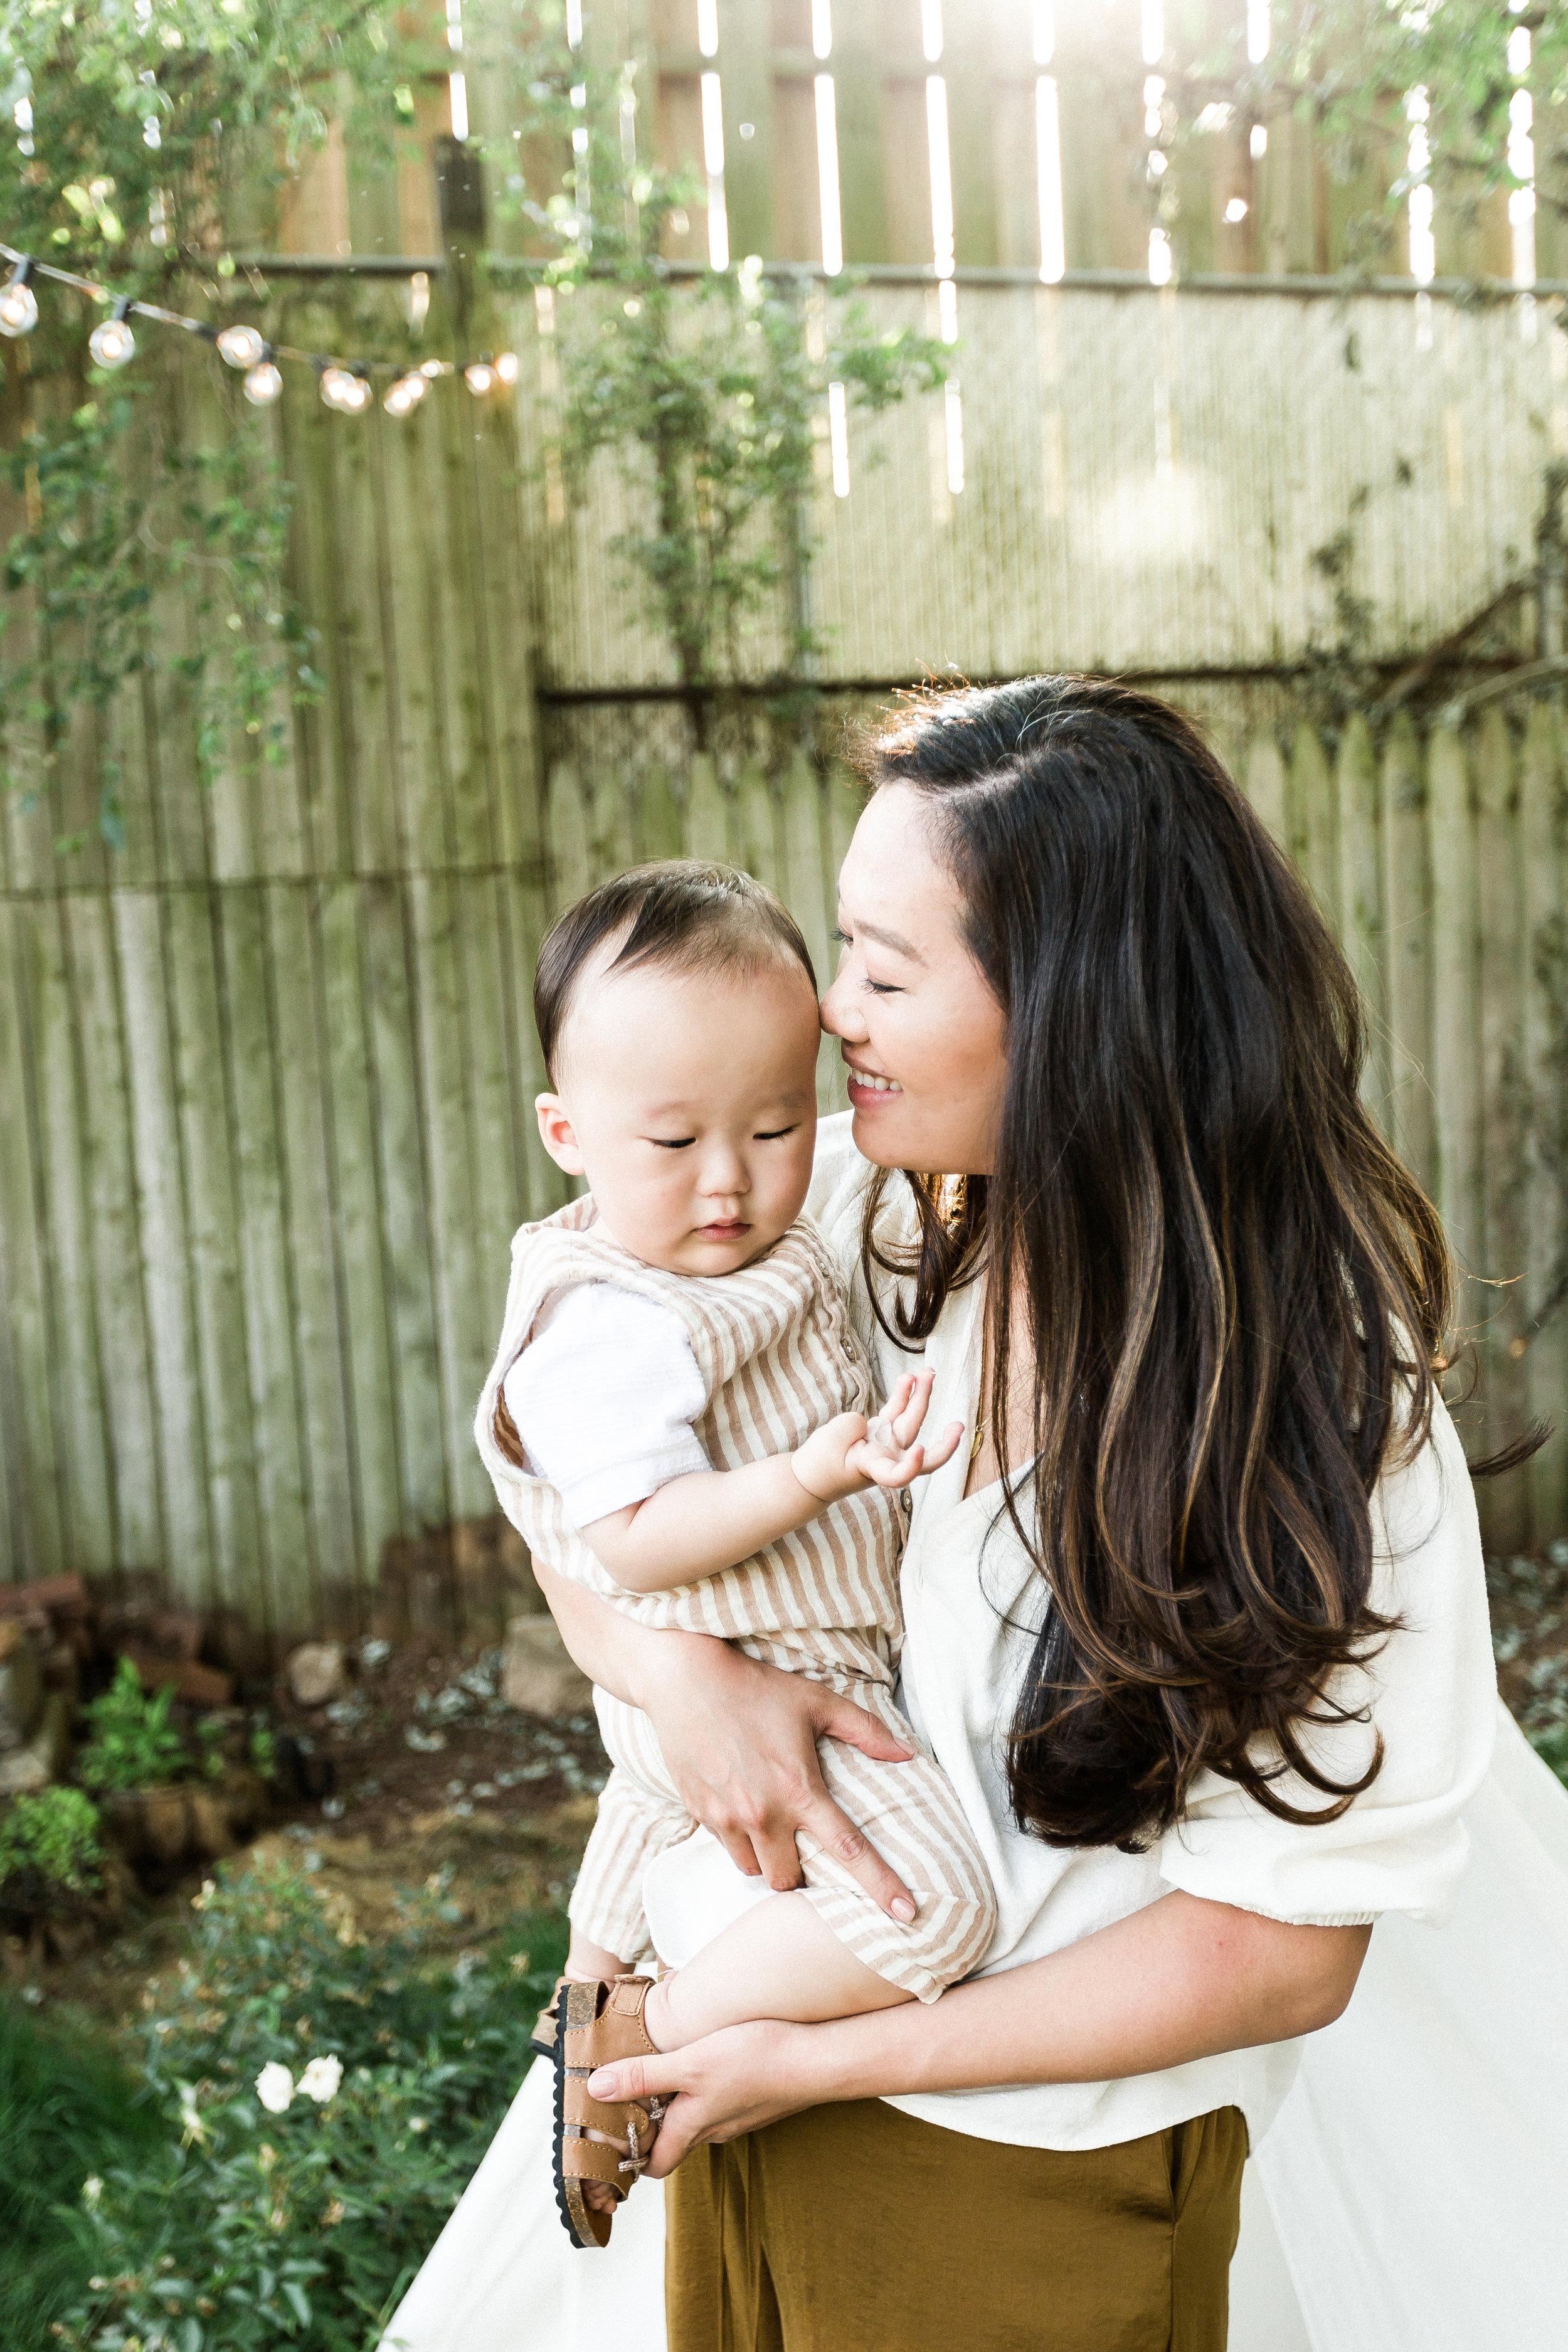 lissie-loomis-photo-nyc-family-photographer-brooklyn-baby41.JPG